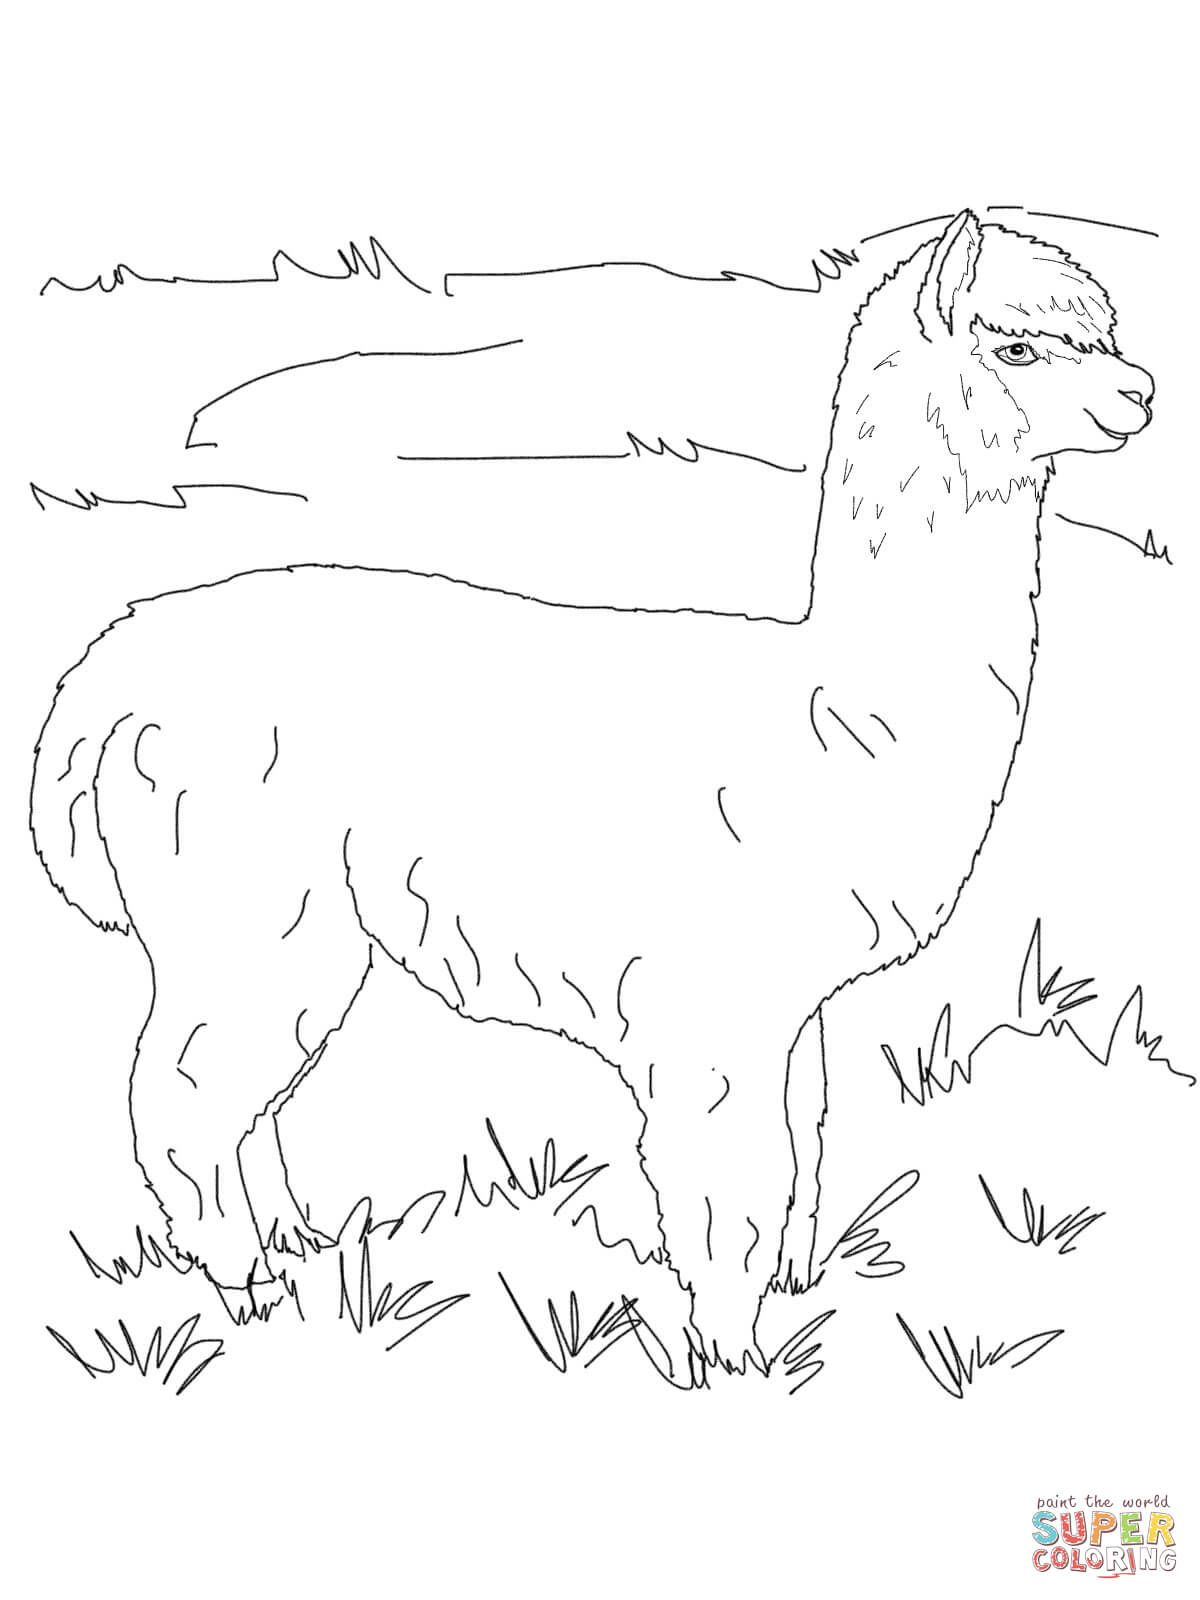 draw an alpaca | How to | Pinterest